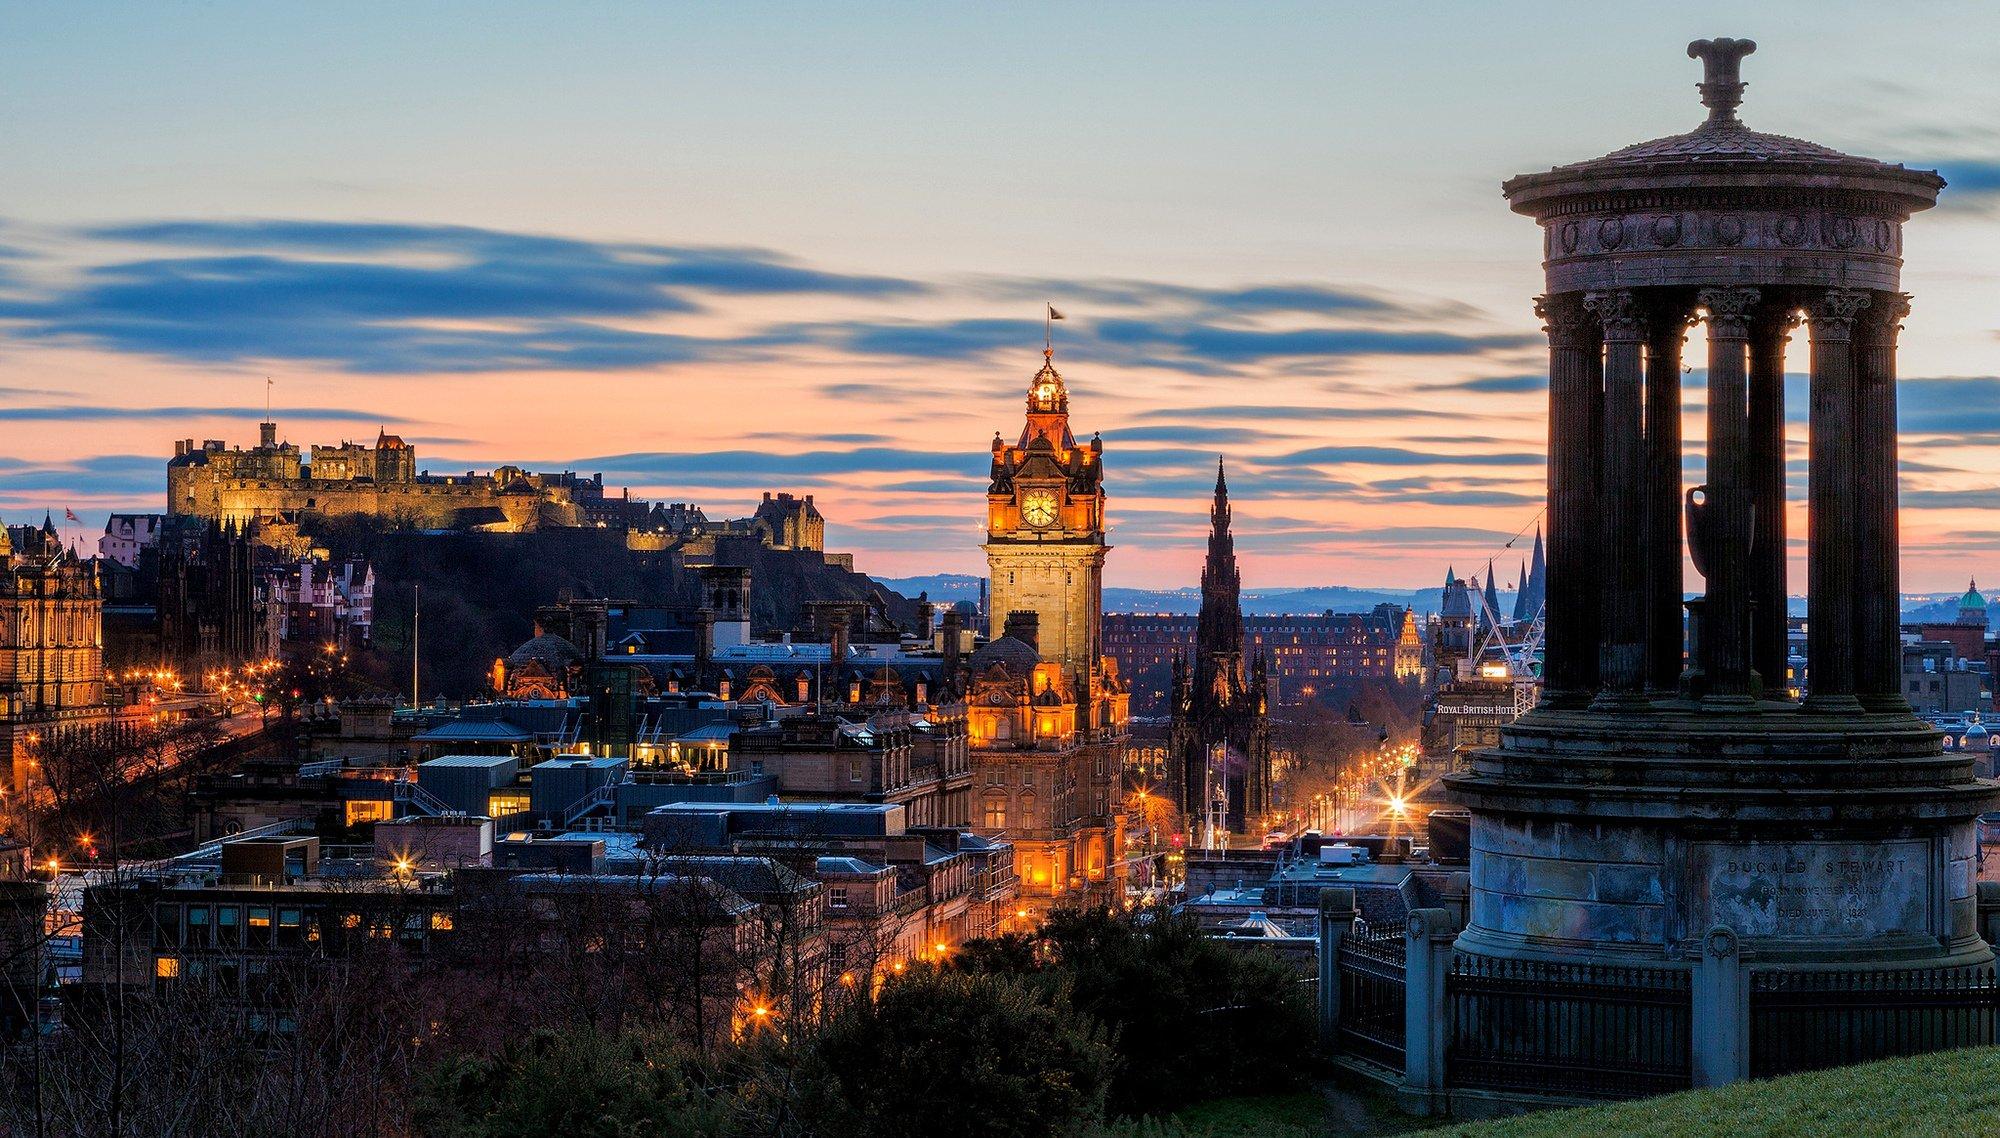 edinburgh scotland wallpaper - photo #22